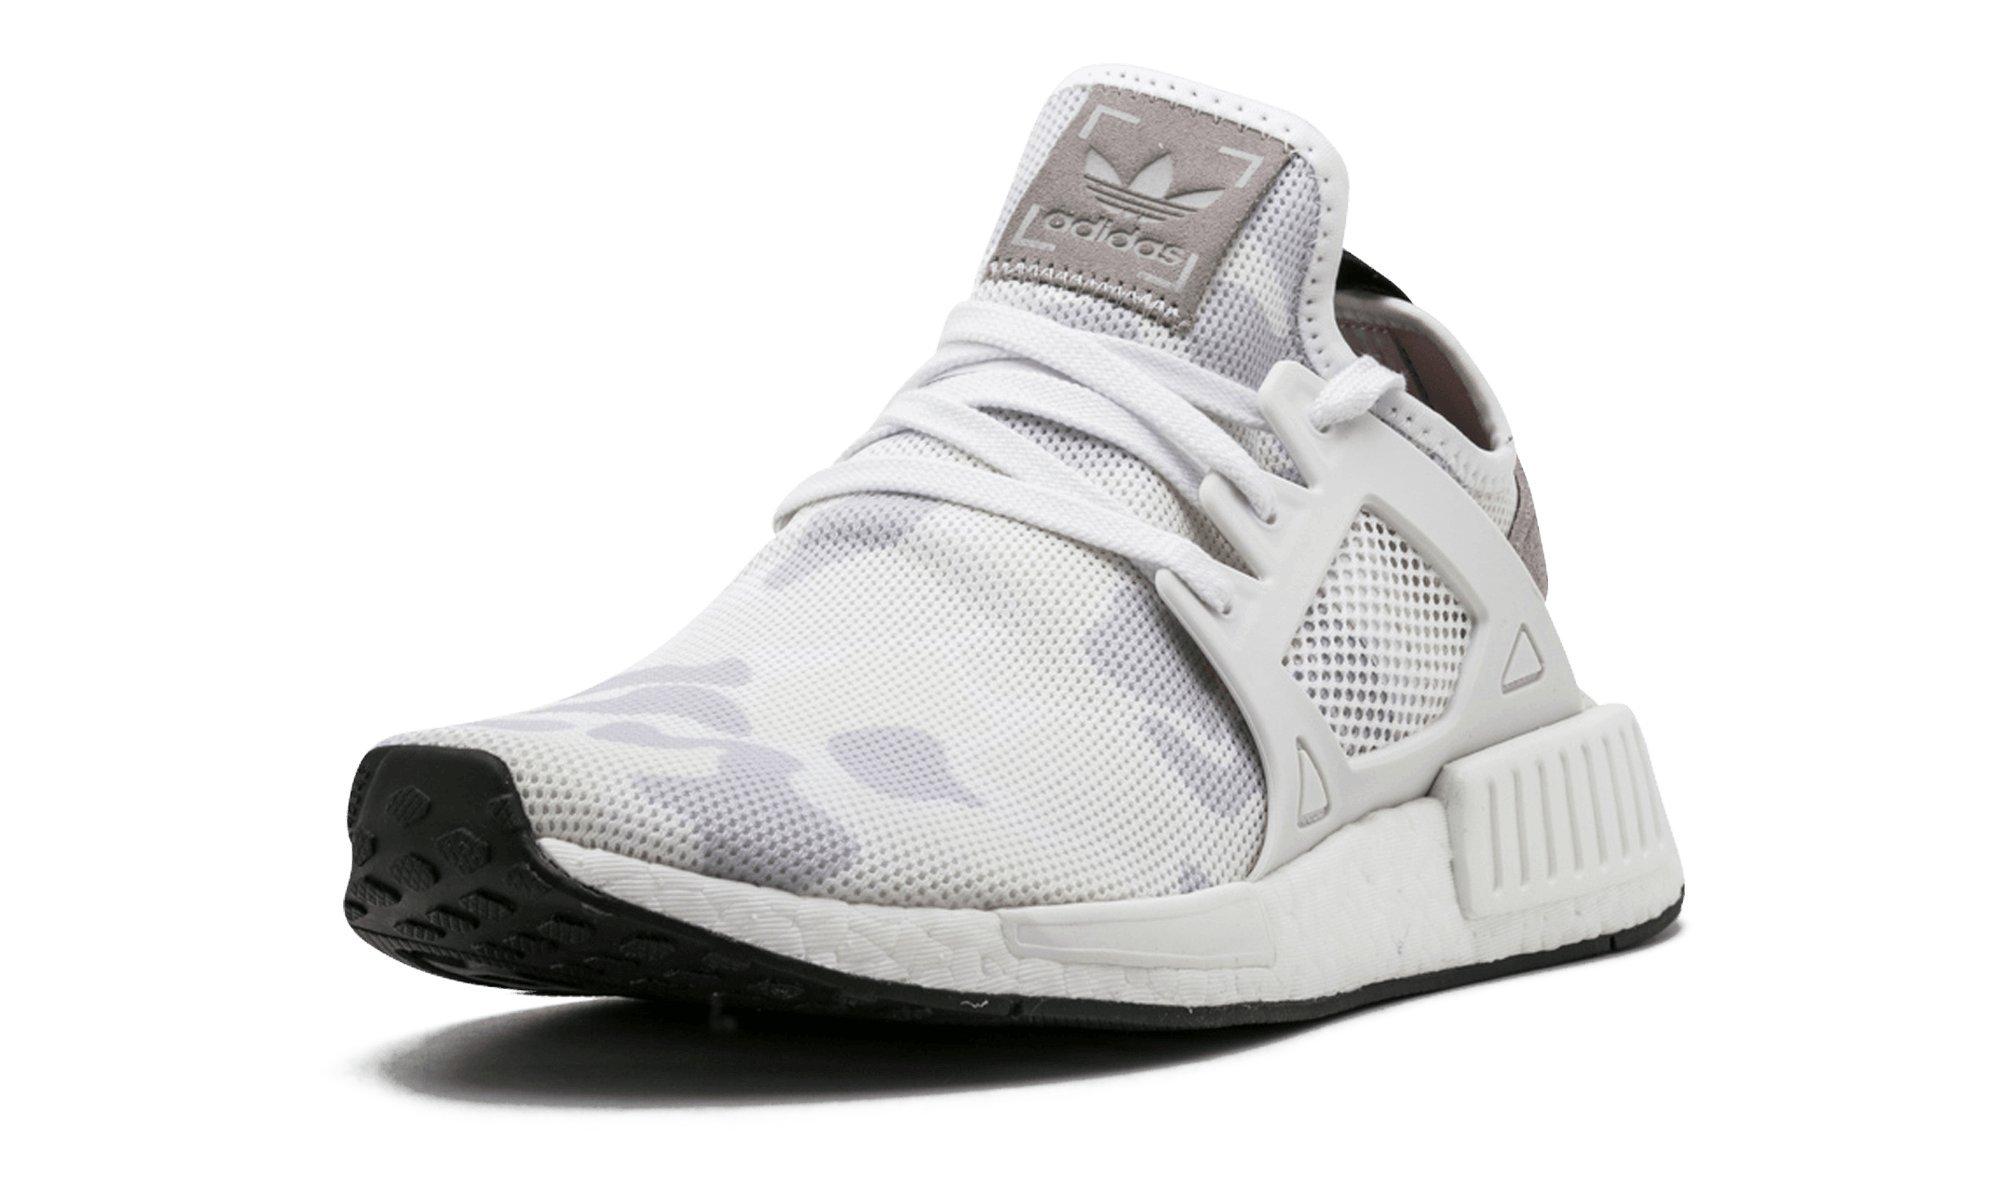 online retailer 0e12b 70887 australia adidas nmd runner black ice purple quilt 94ced bc6b4